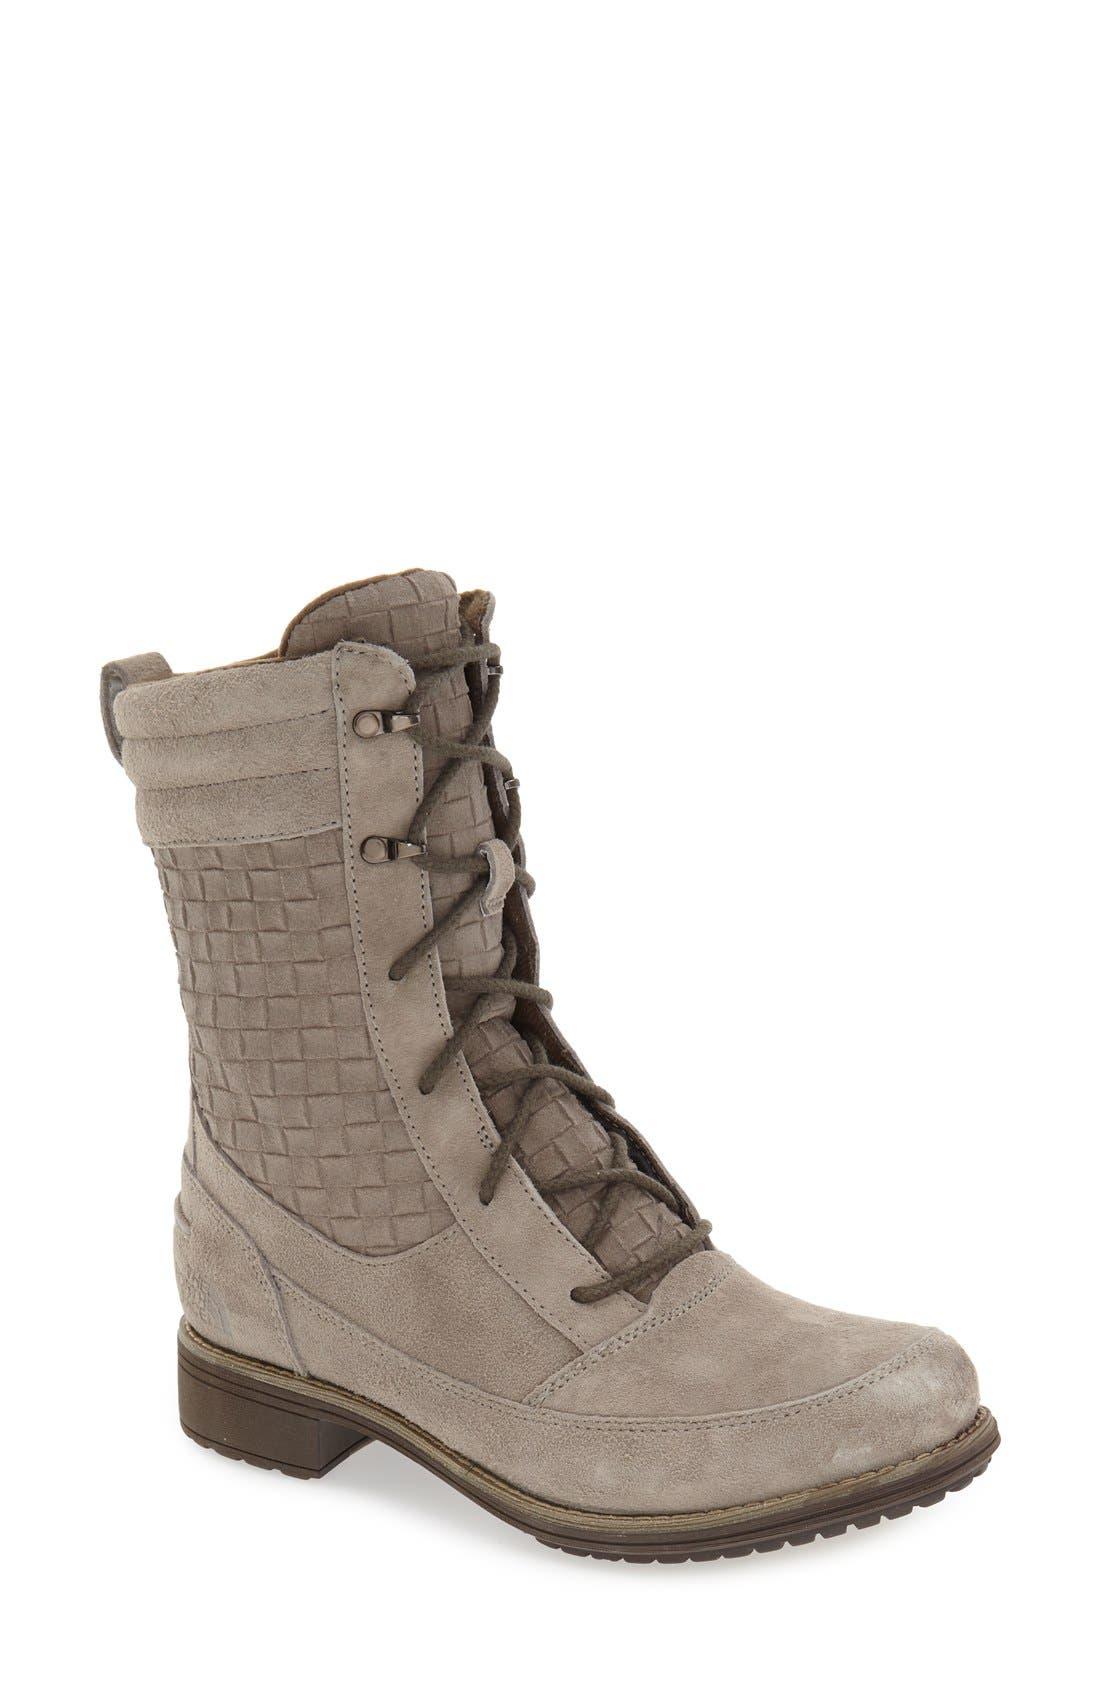 Alternate Image 1 Selected - The North Face 'Bridgeton Lace' Waterproof Boot (Women)